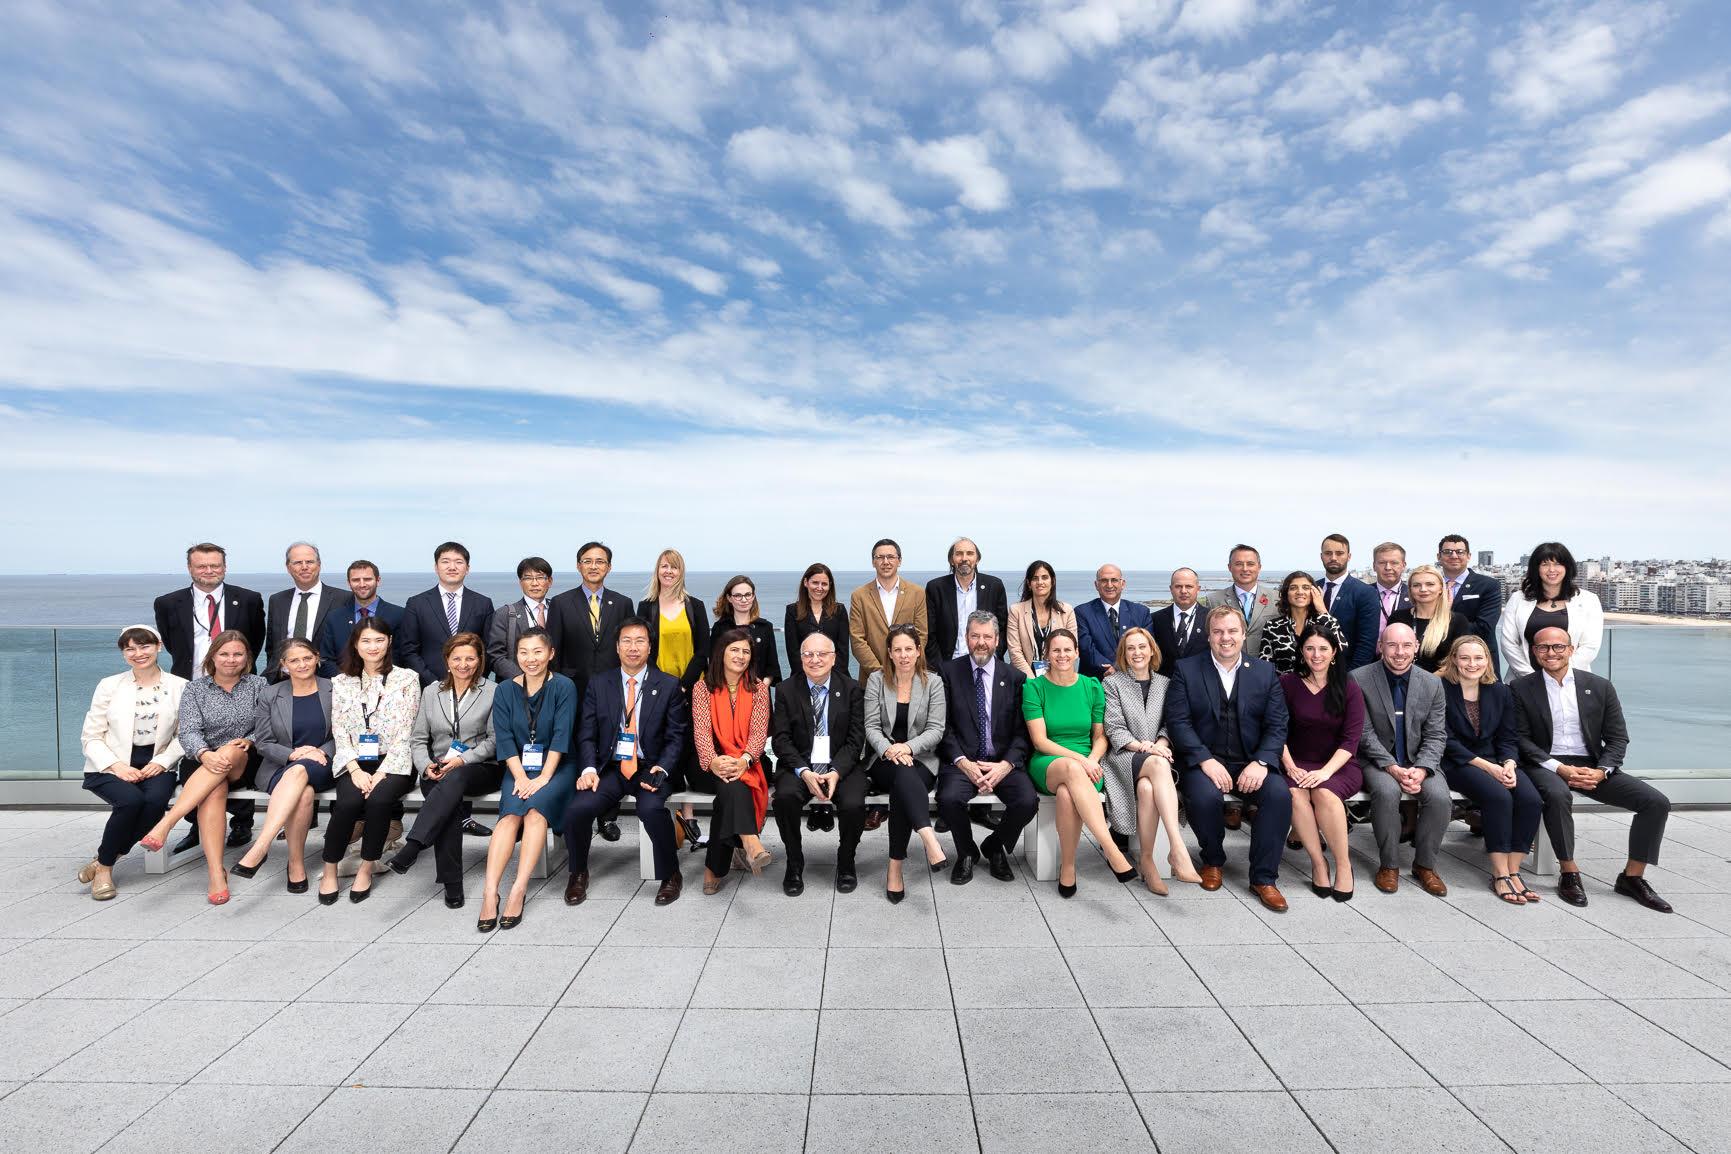 International Delegates from the Digital Nations Ministerial Summit, Uruguay 2019